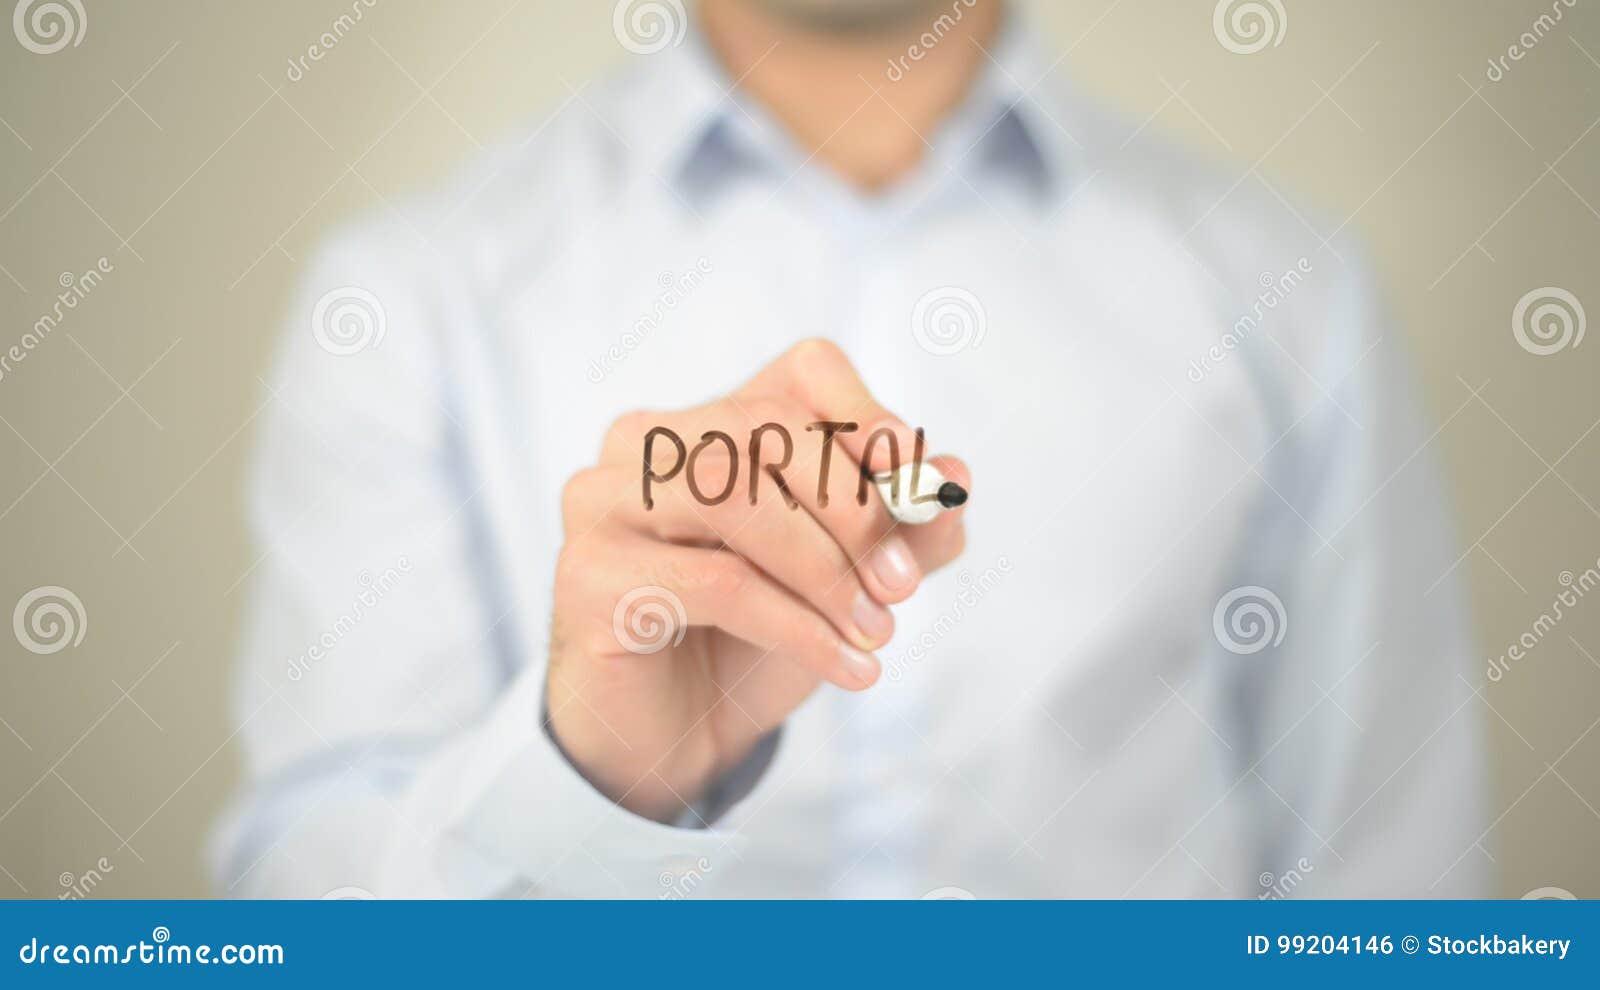 Portal , Man writing on transparent screen